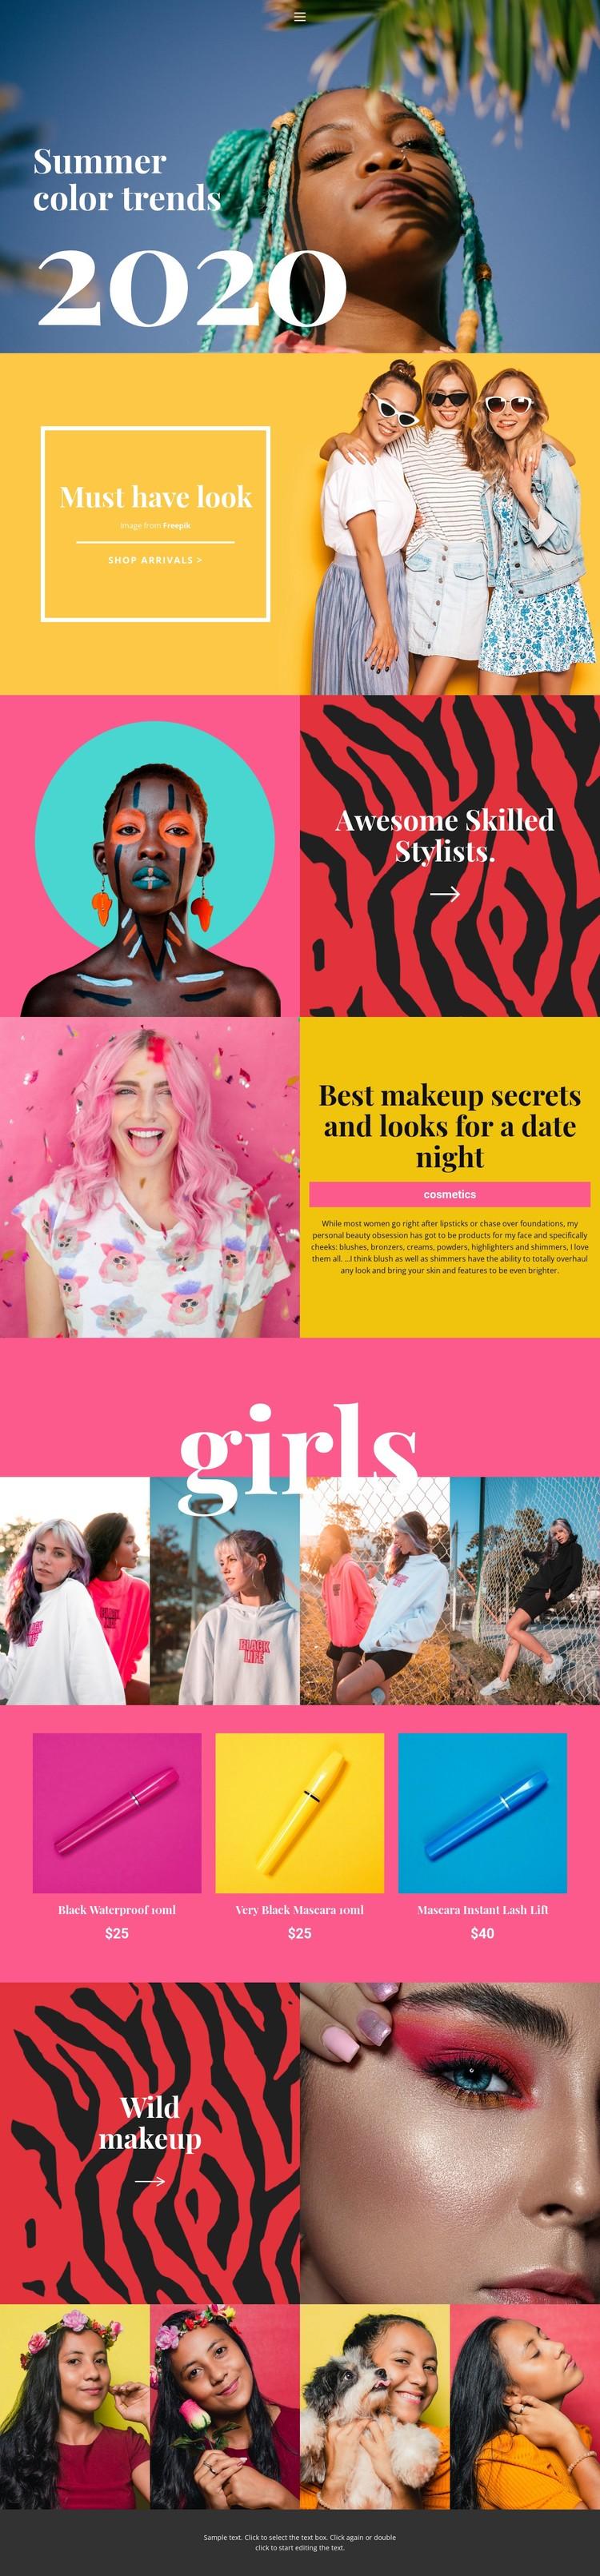 Beauty trends info Static Site Generator